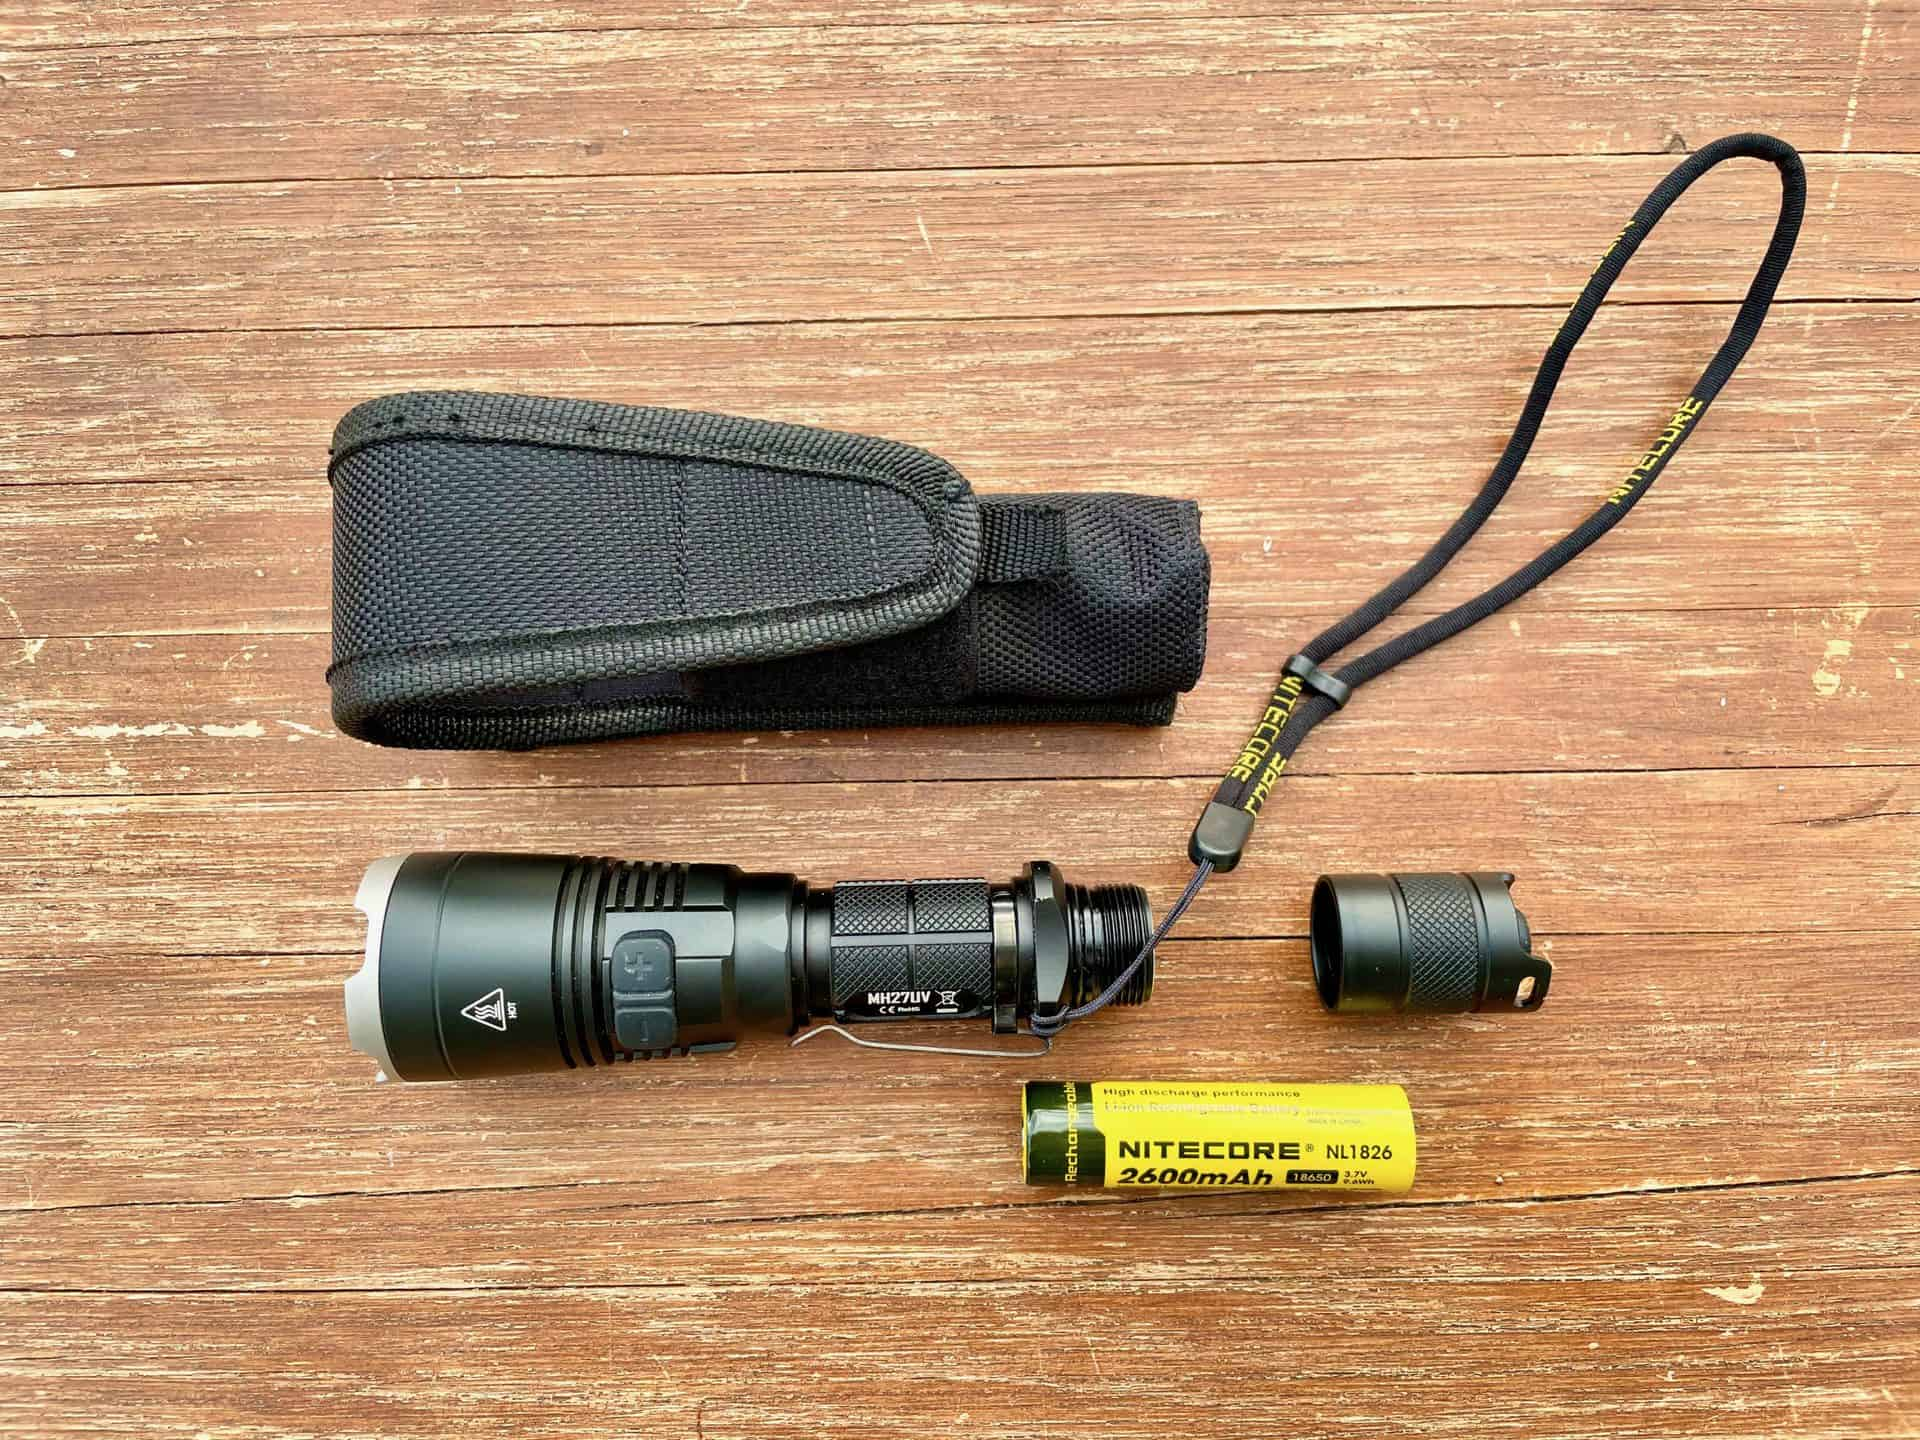 LED-Taschenlampe-Nitecore-MH27UV-laden-zerlegt